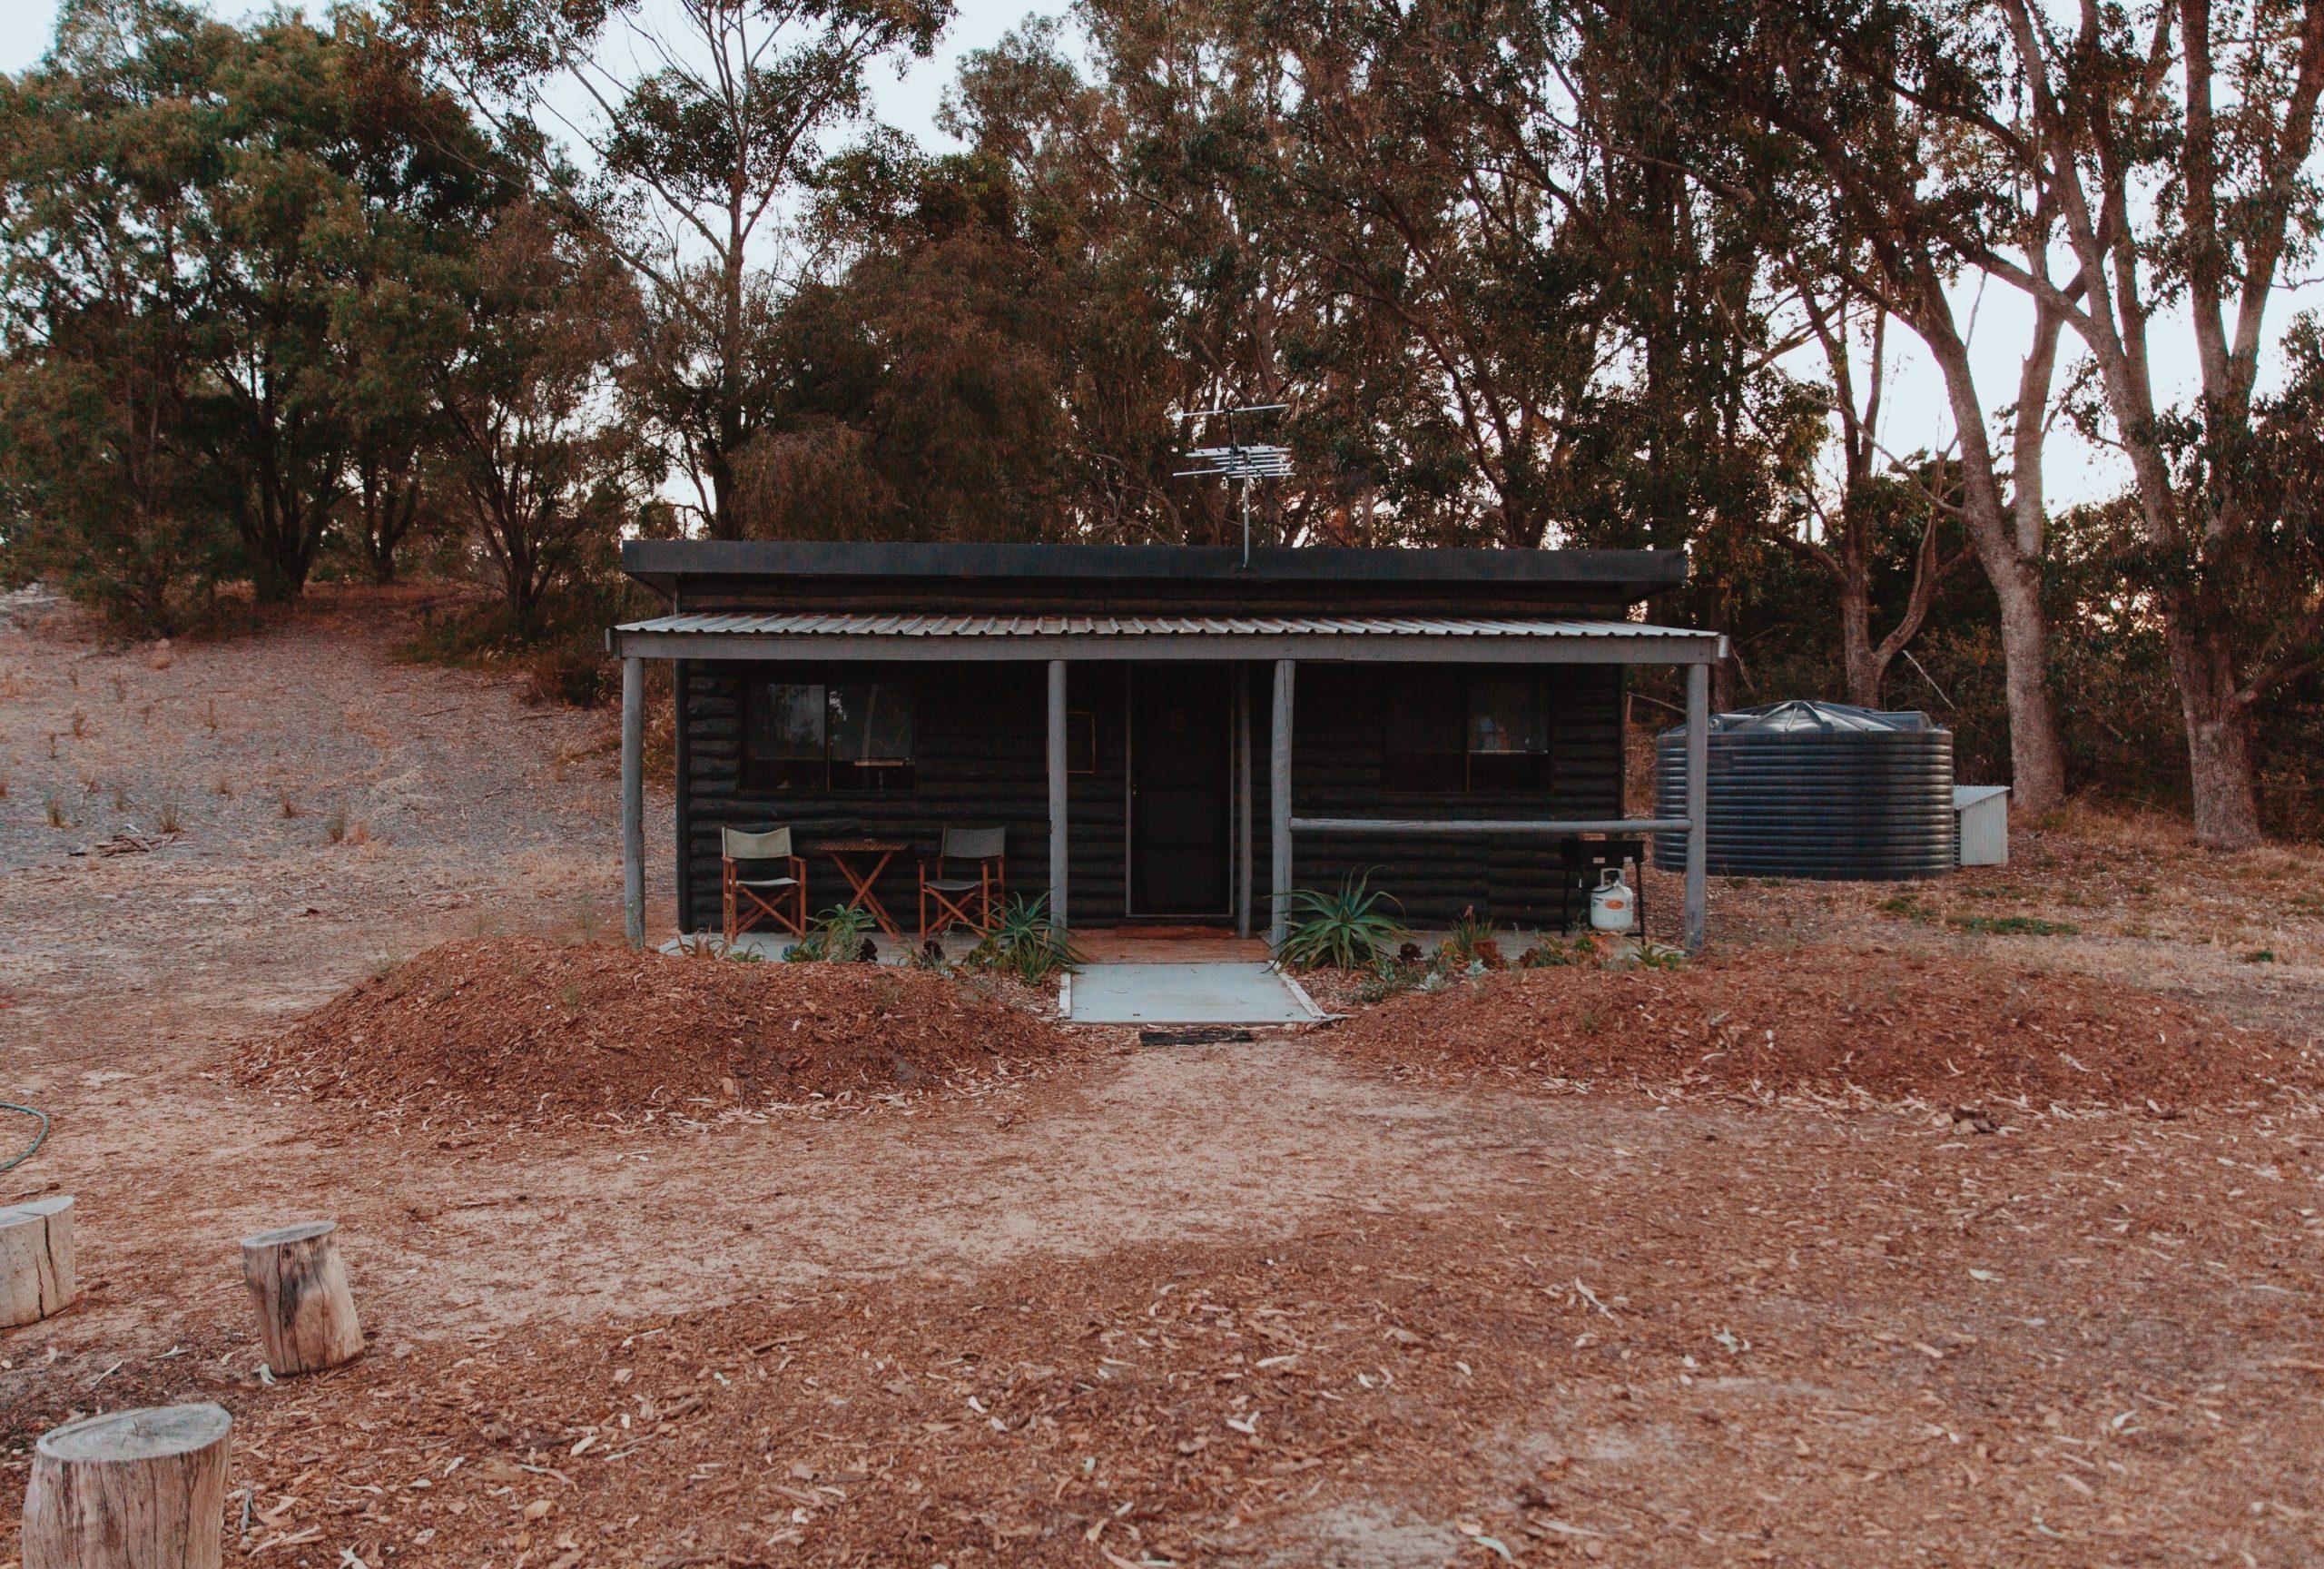 Log cabins nestle behind the sand dunes in Western Australia